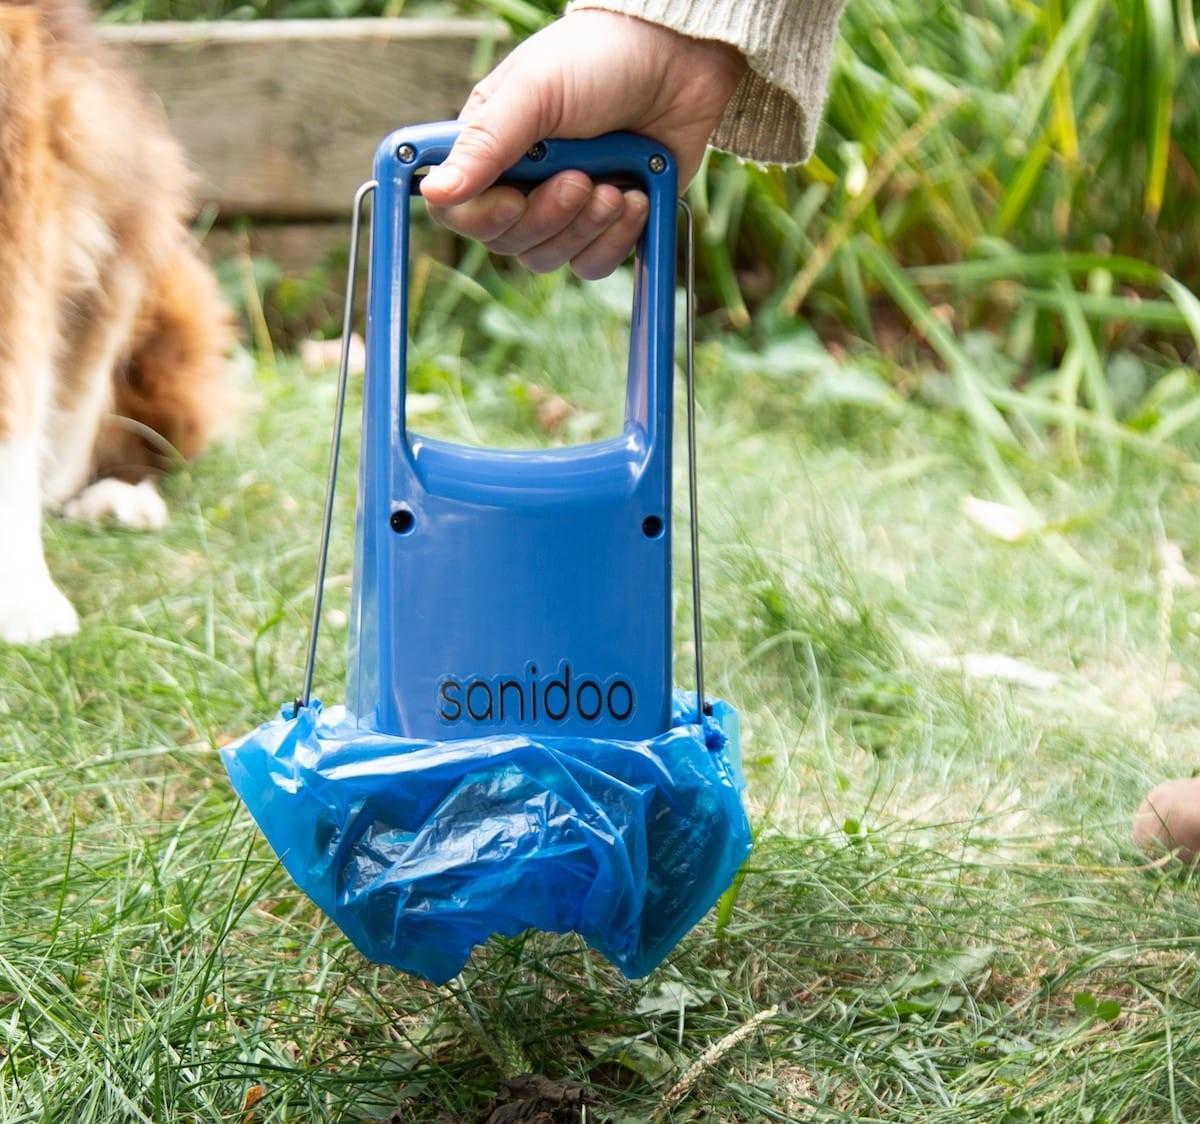 Sanidoo handheld pooper scooper ensures you can stop touching your pup's poo